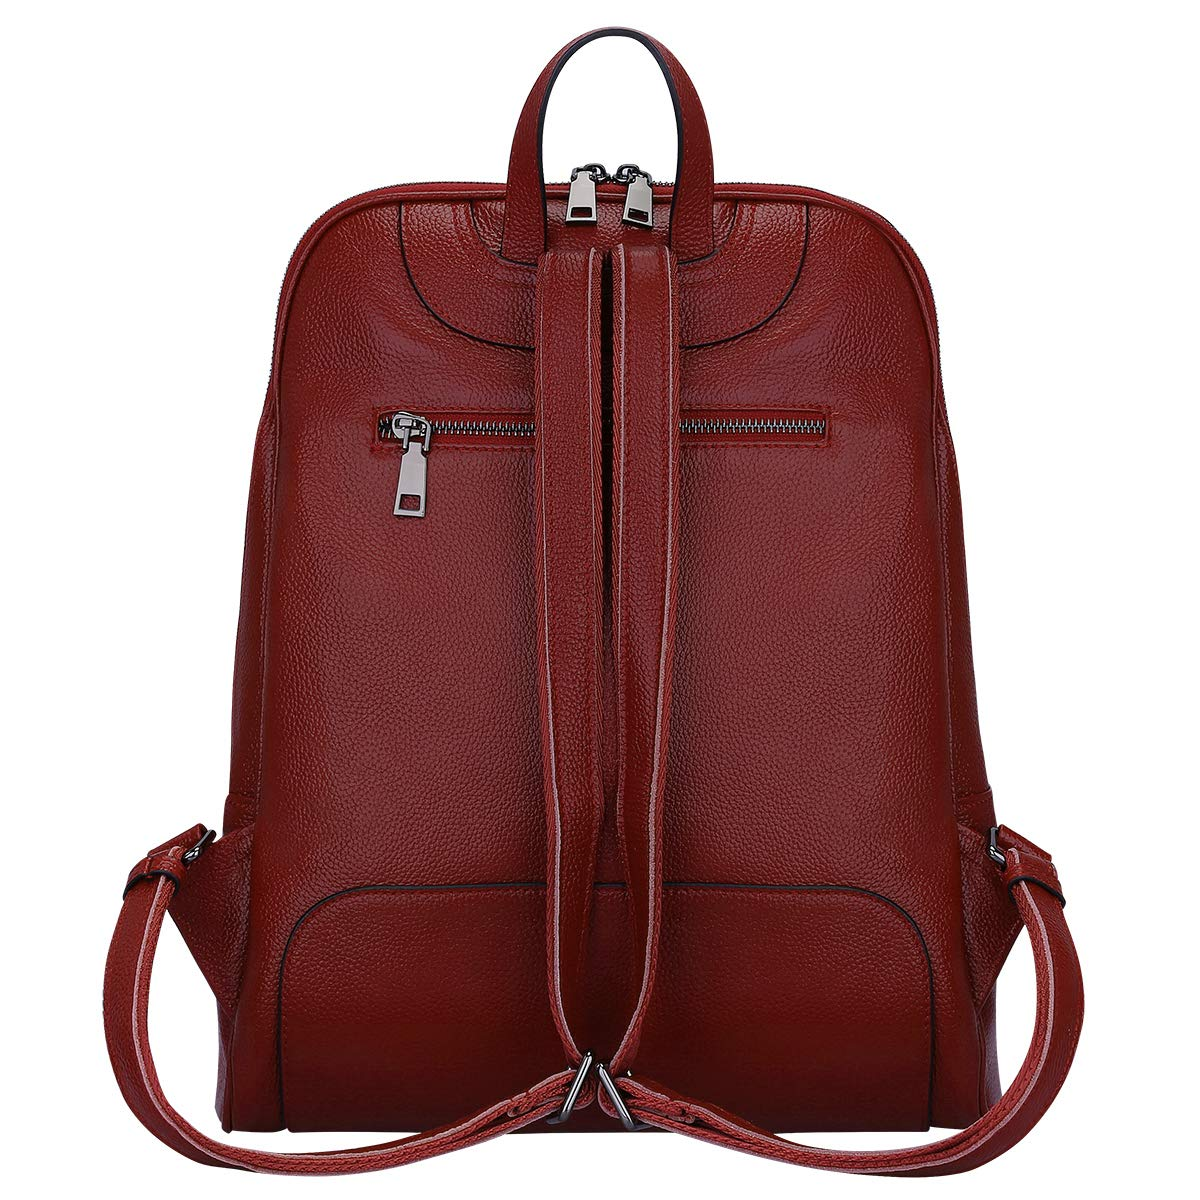 S-ZONE 14 tum bärbar dator kvinnor äkta läder ryggsäck mode ryggsäck handväska ledig axel dam resväska Vinröd